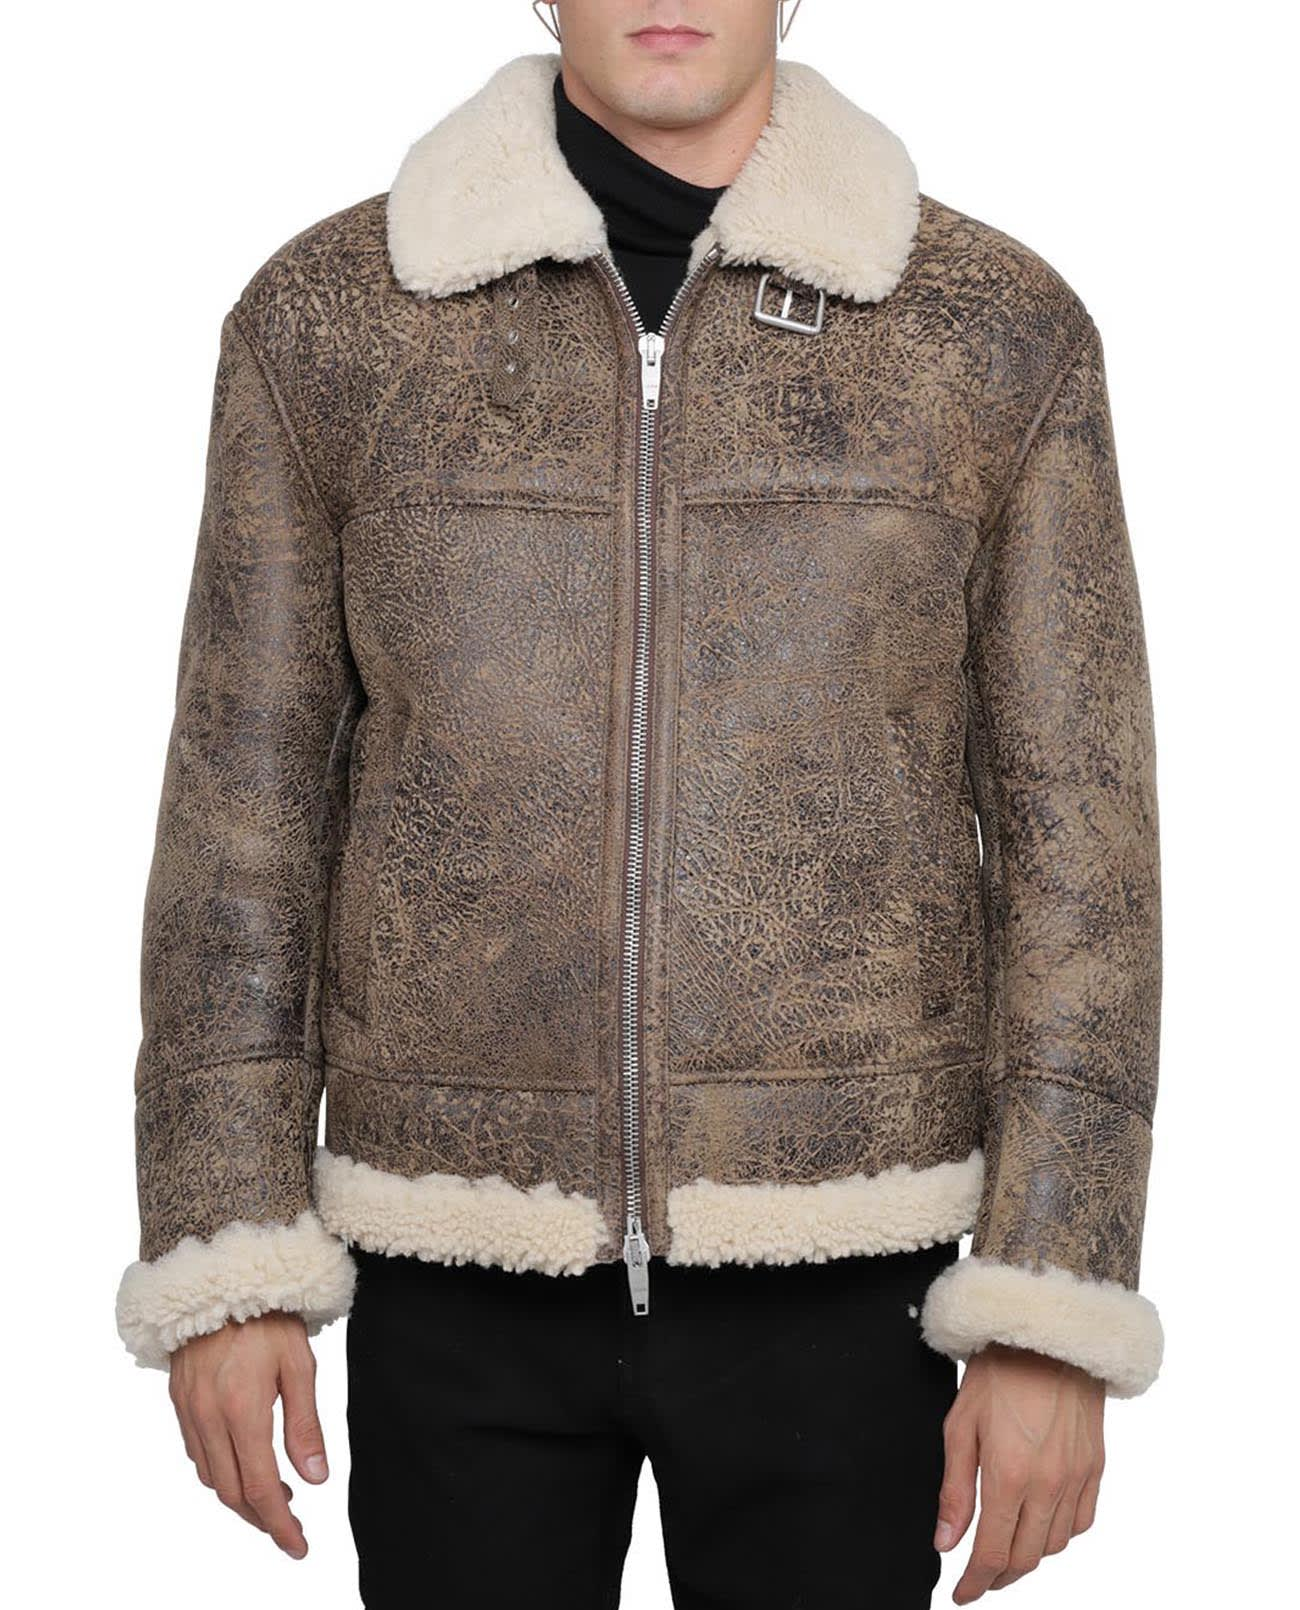 Brown Shearling Jacket Men